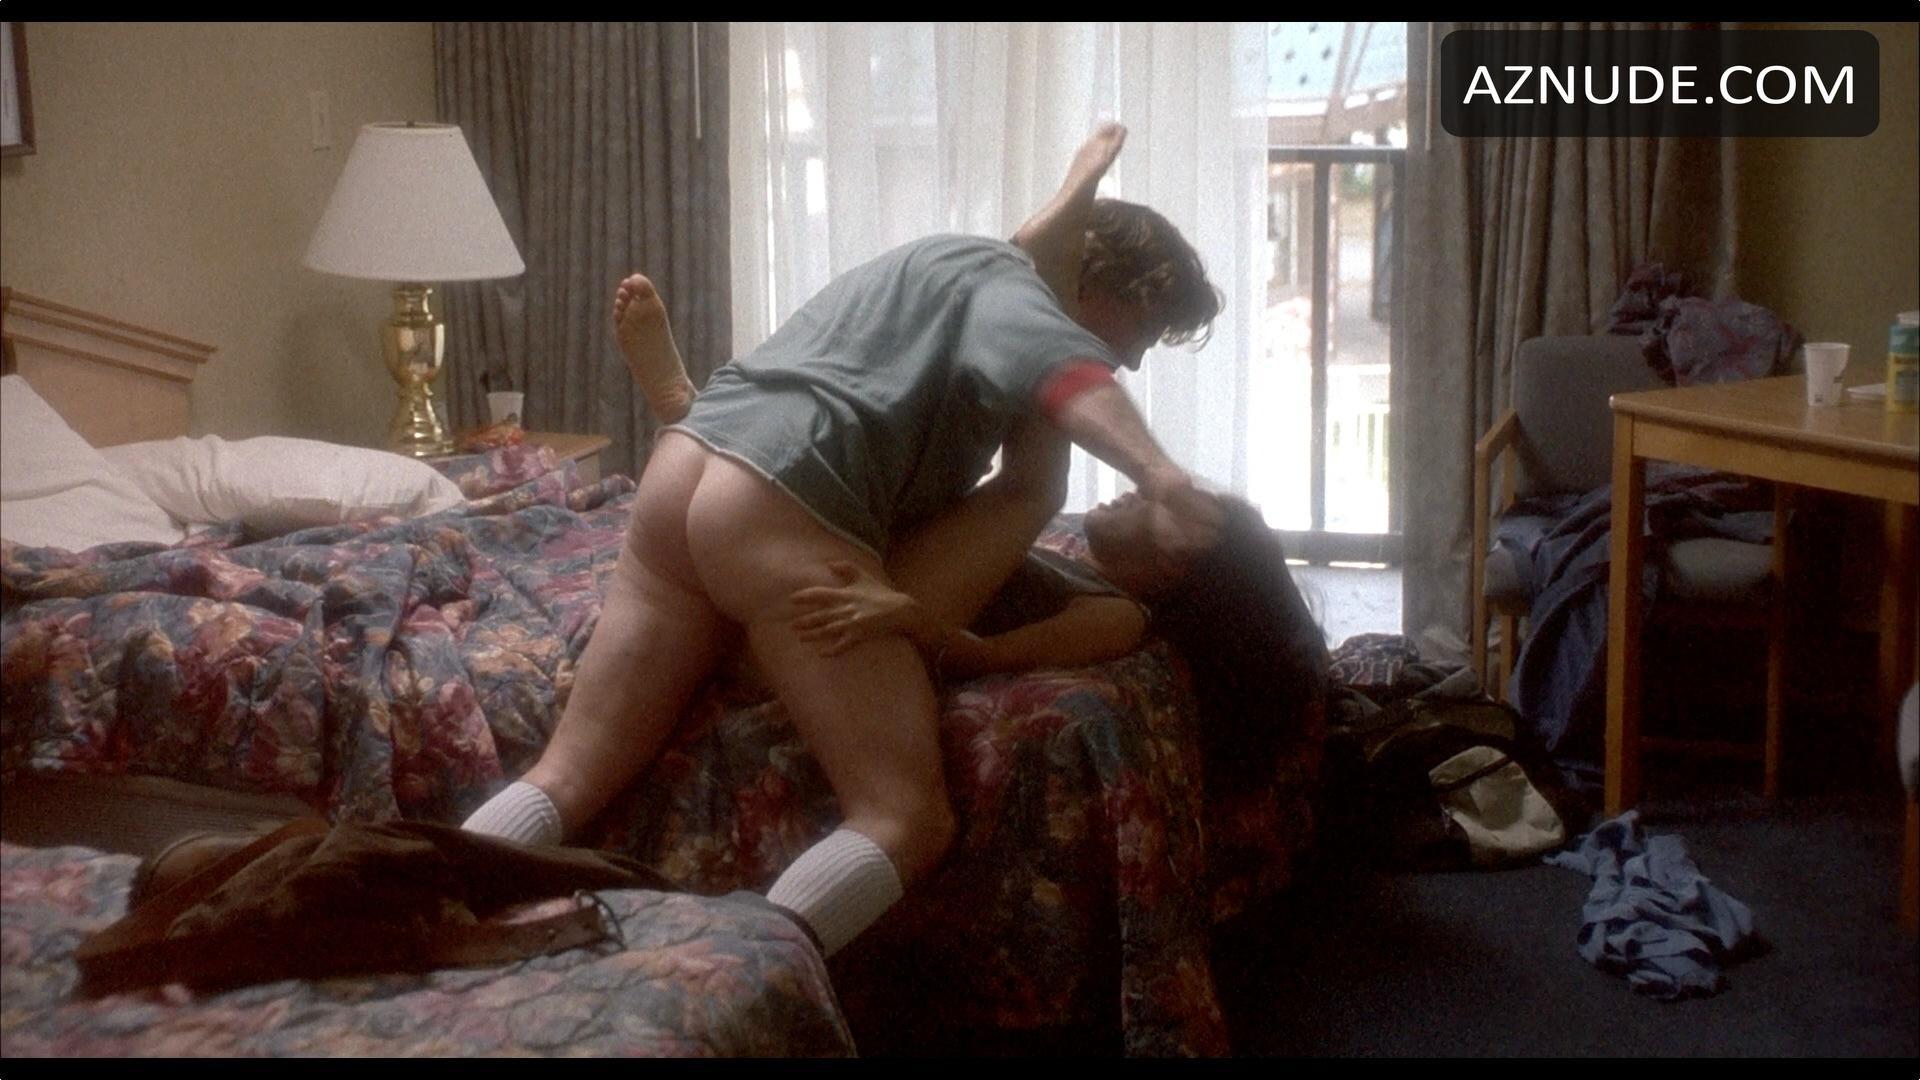 Sideways sex scene